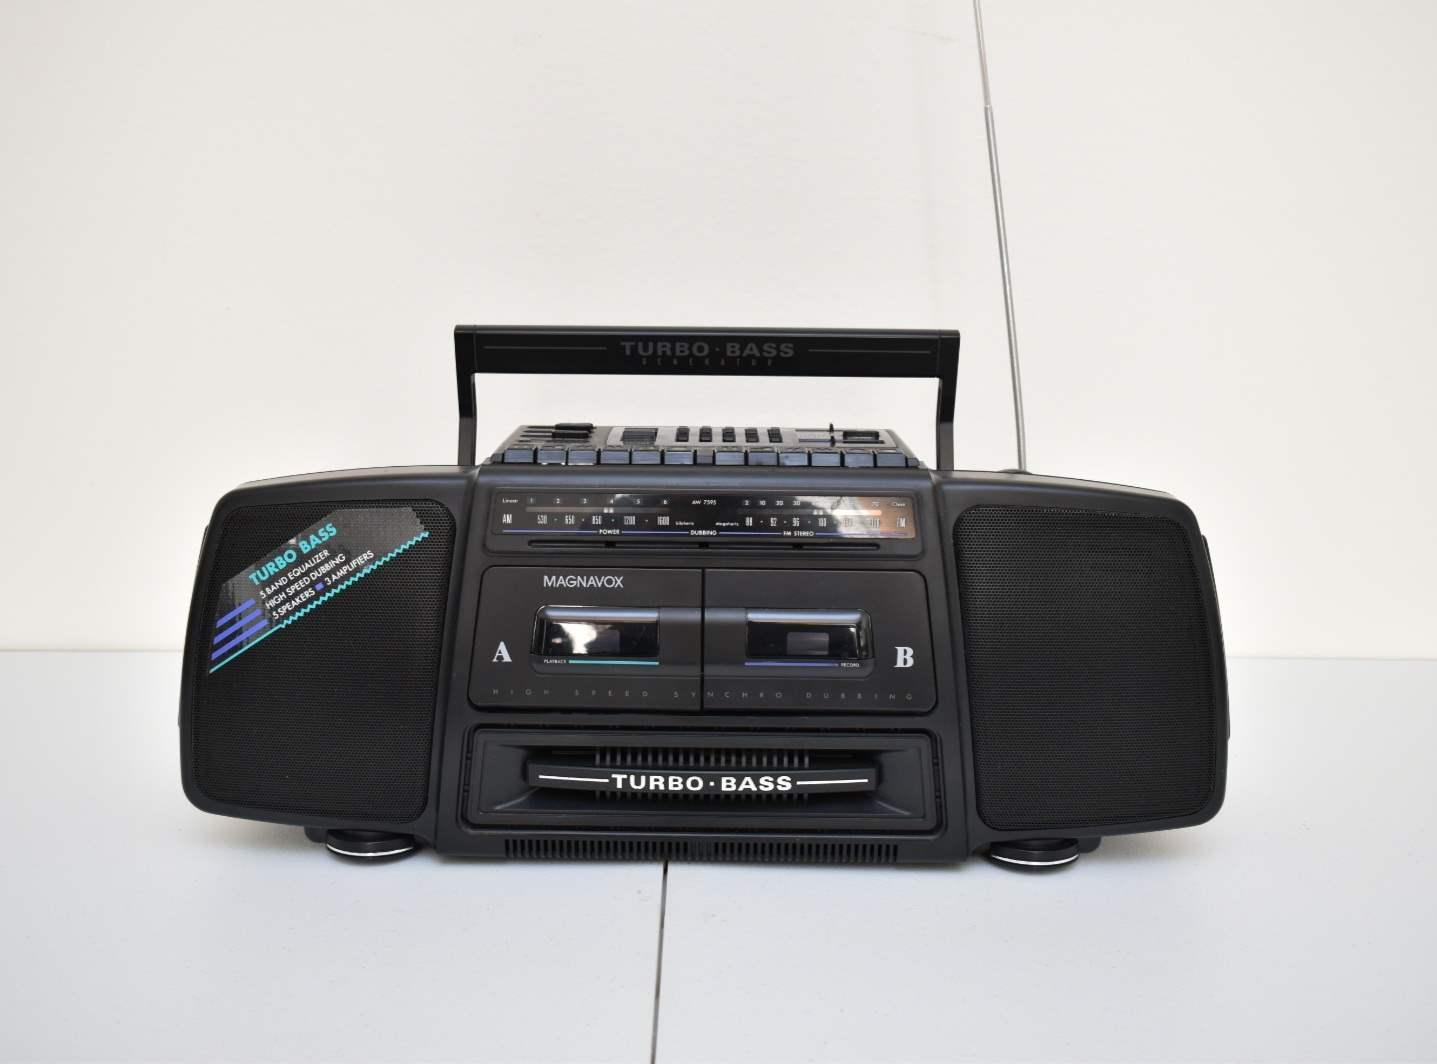 Magnavox Turbo Bass Radio